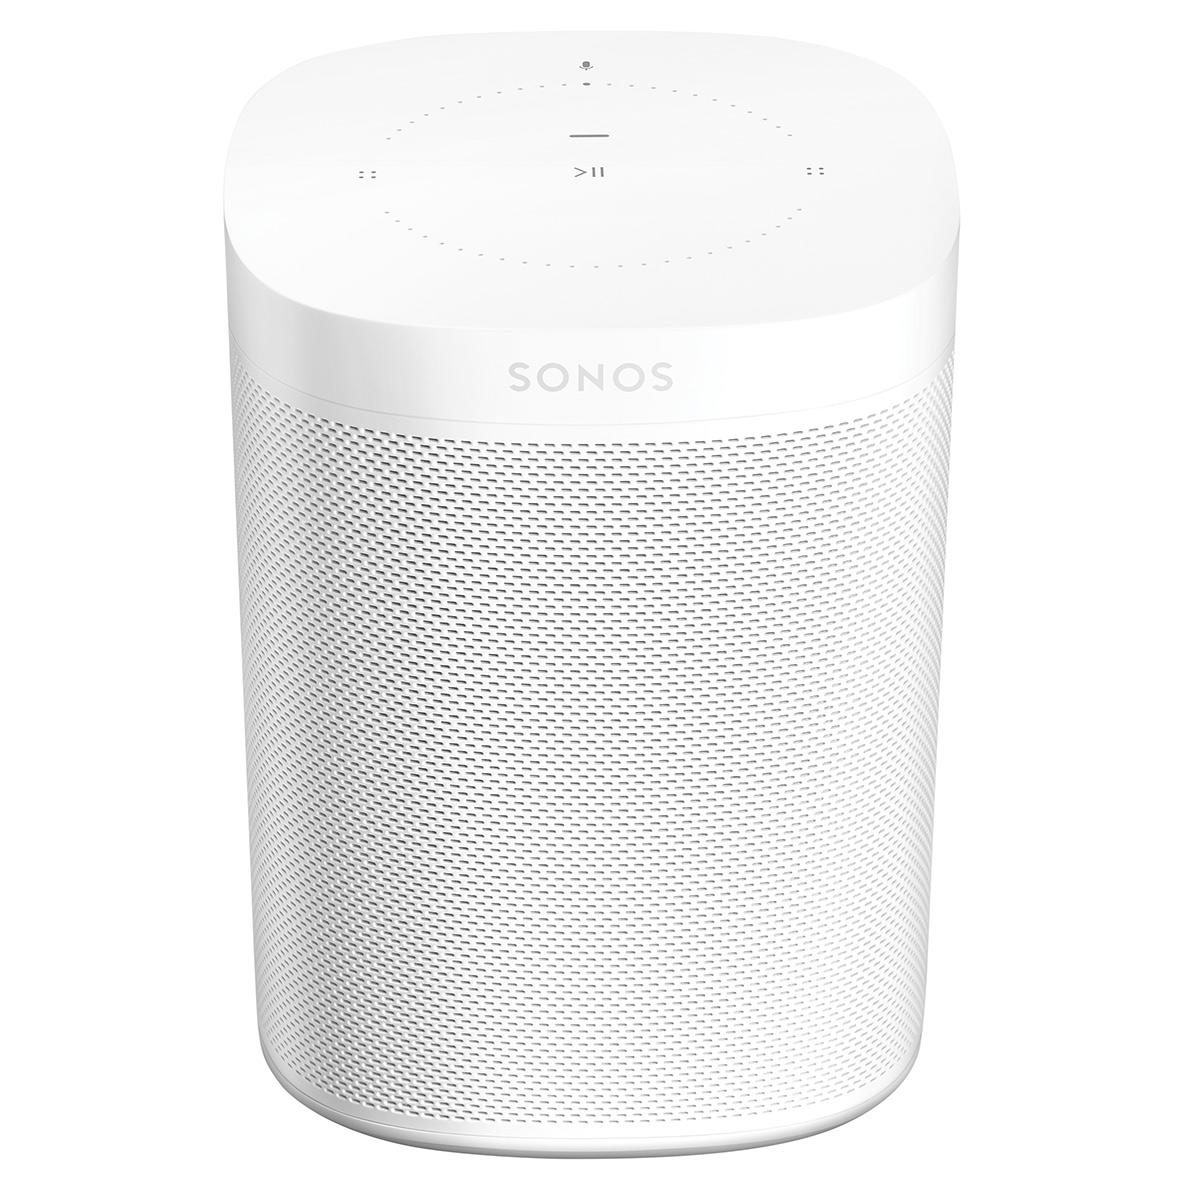 Sonos-One-Voice-Controlled-Wireless-Smart-Speaker-Gen-2 thumbnail 14